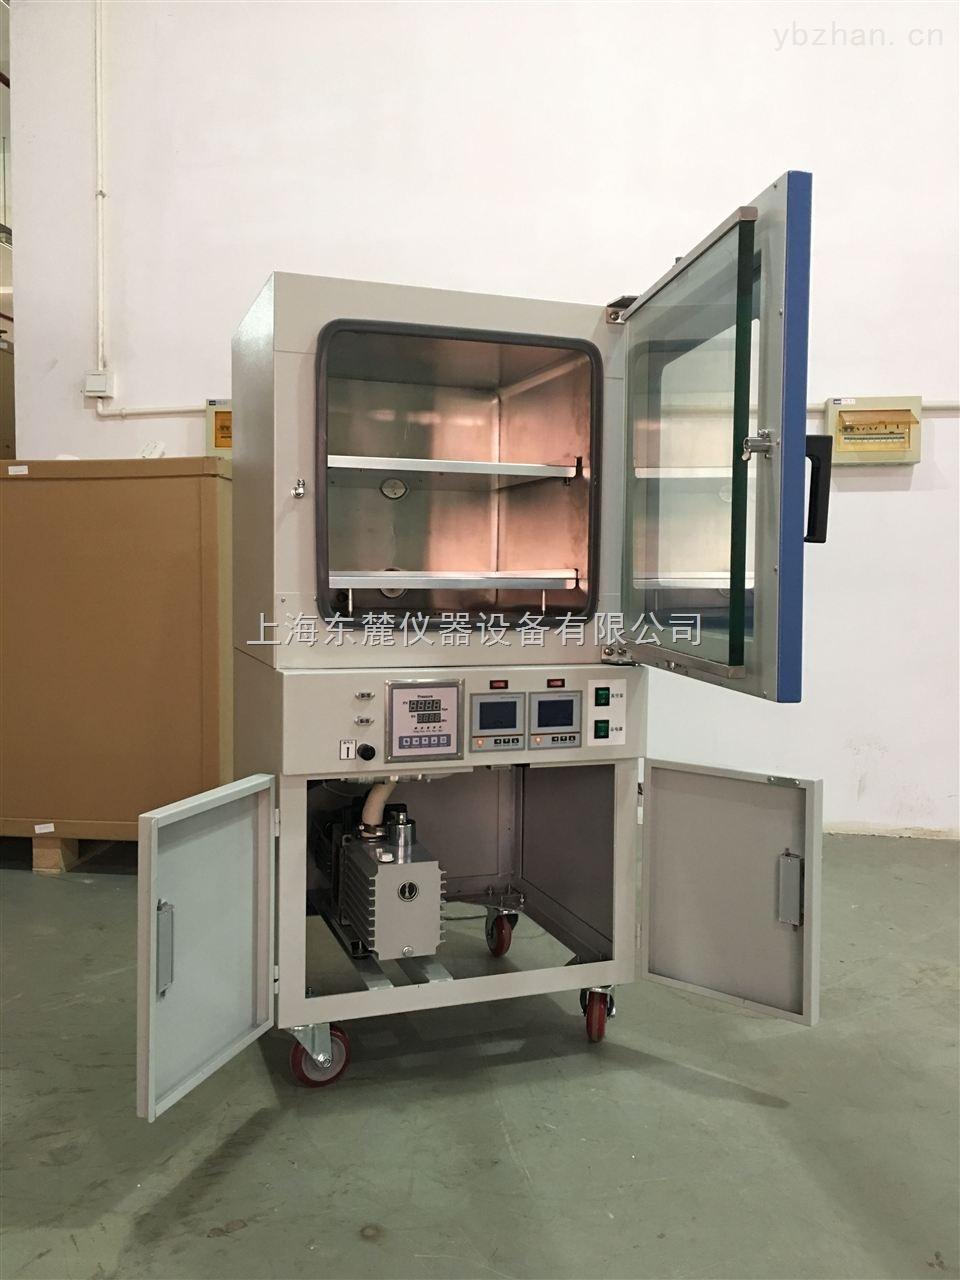 DZF-6090D-液晶程序顯示真空干燥箱